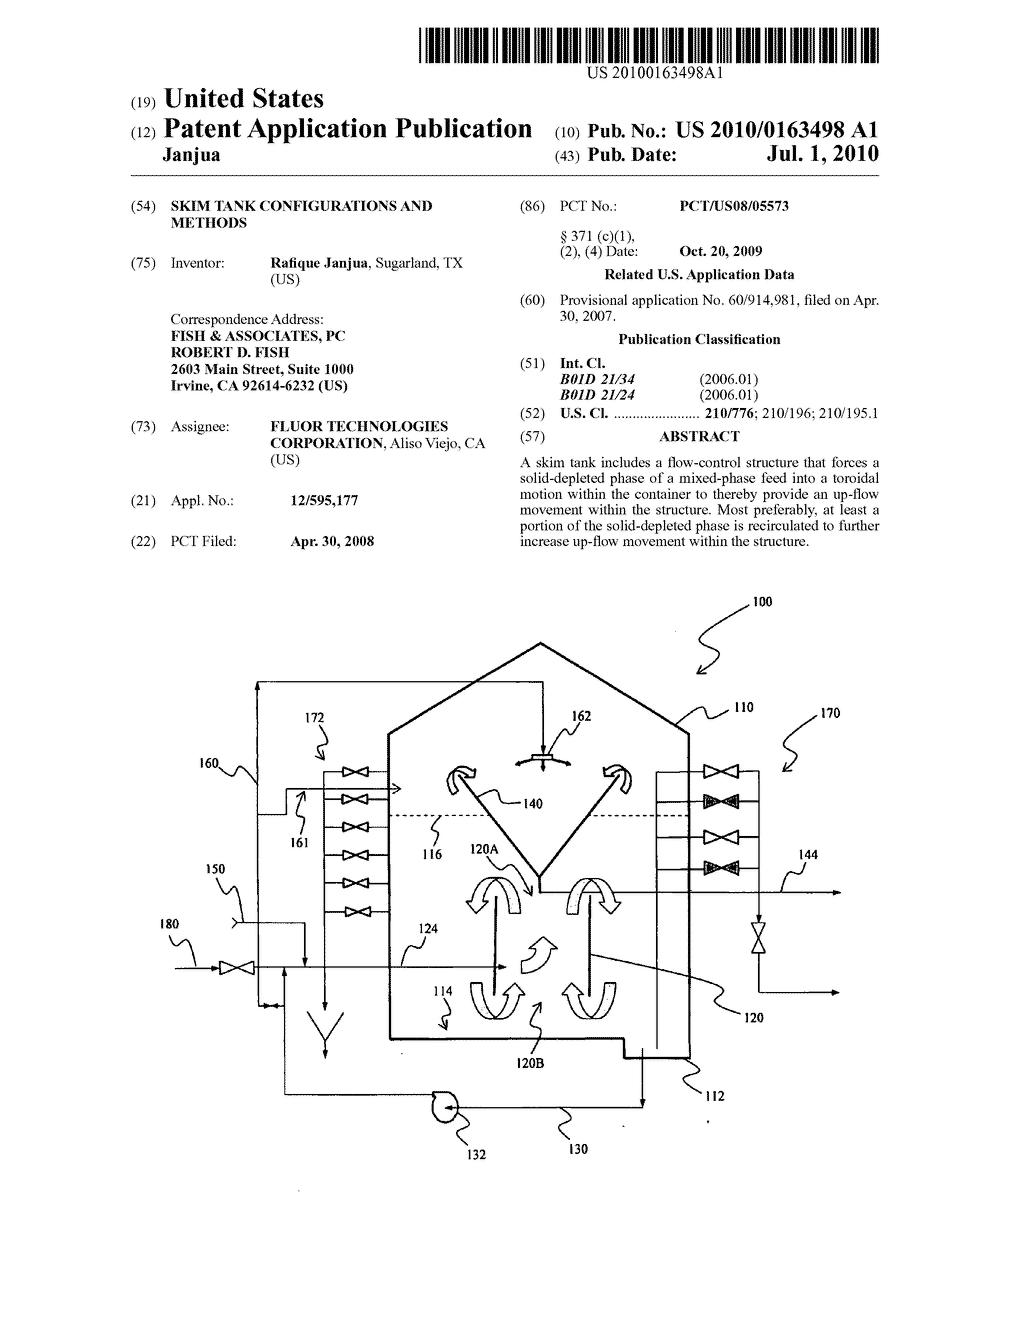 Skim Tank Configurations And Methods Diagram Schematic Image 01 Welding Circuit